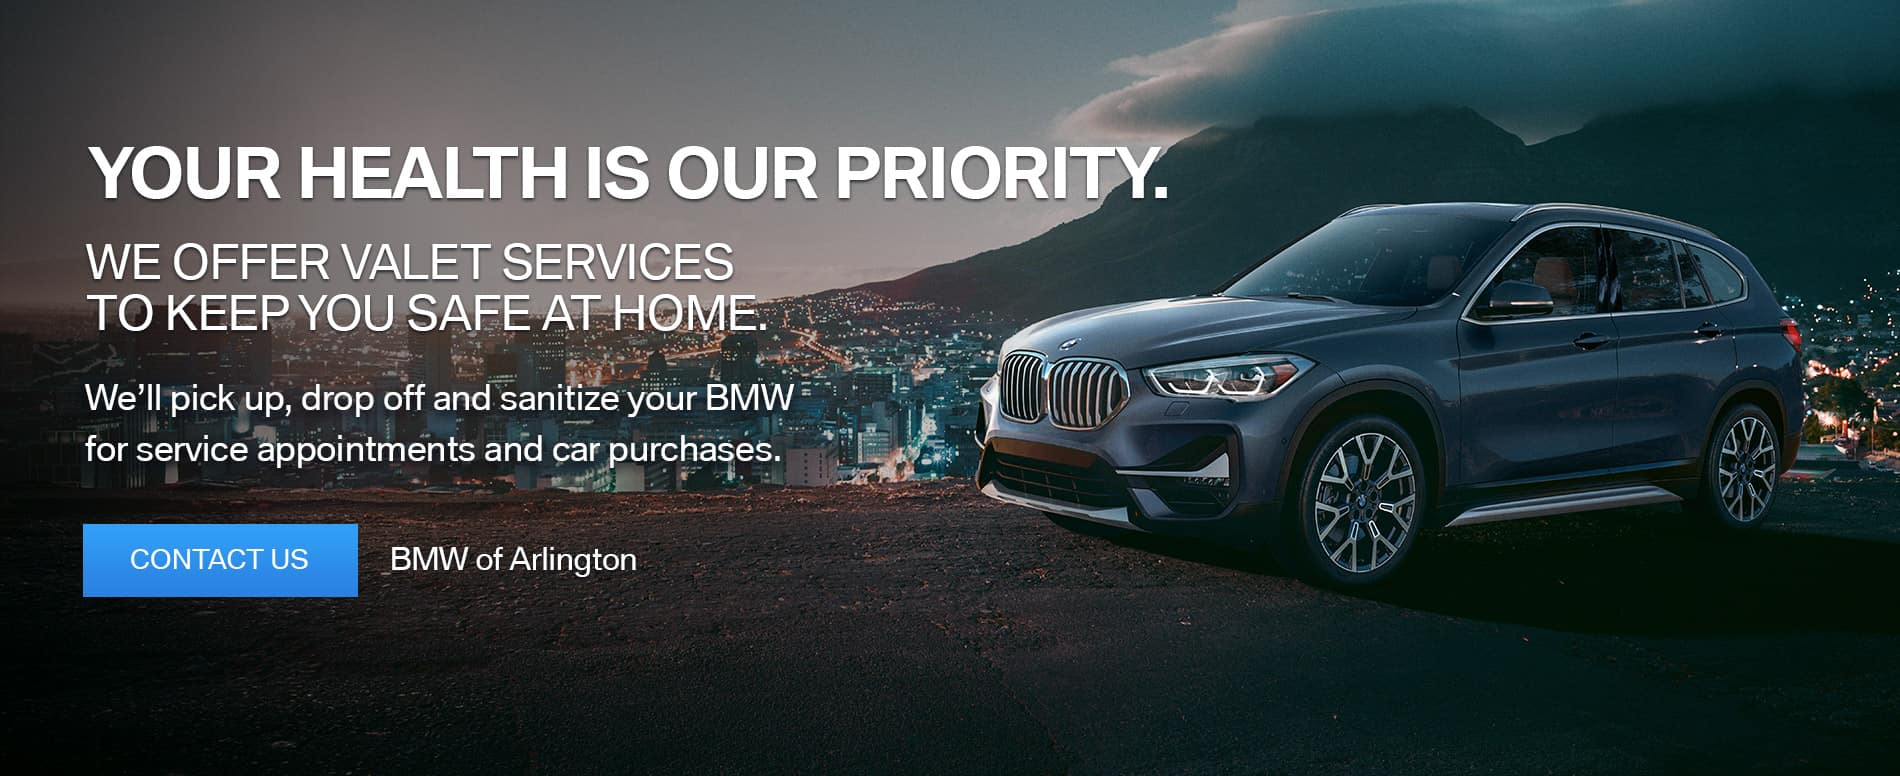 BMWArlington_Health_Slide_03-2020